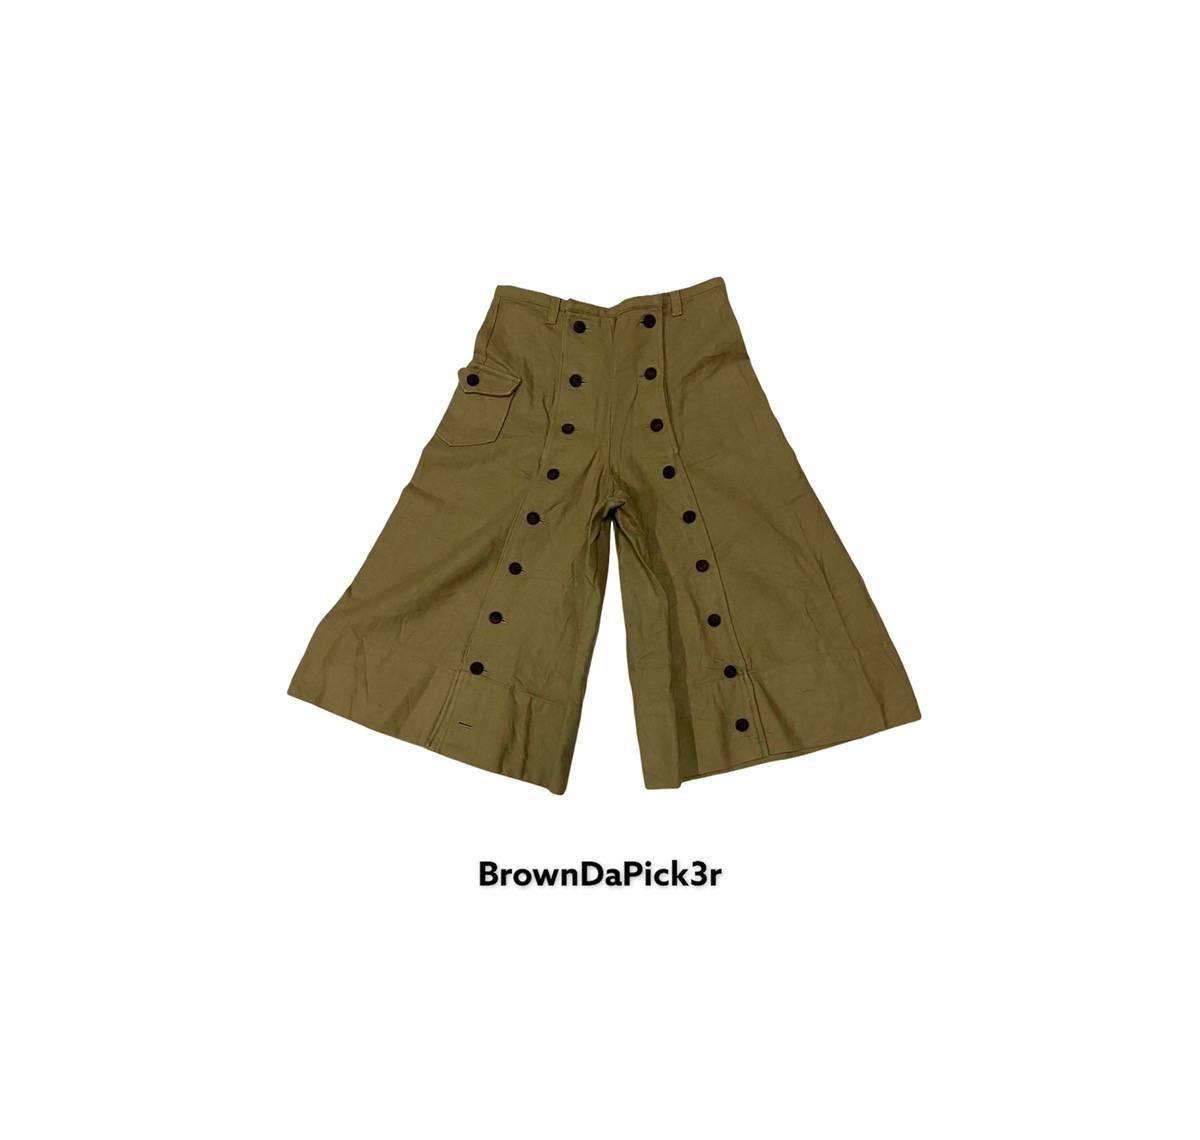 Vintage Beams Boy cropped Pants Trousers